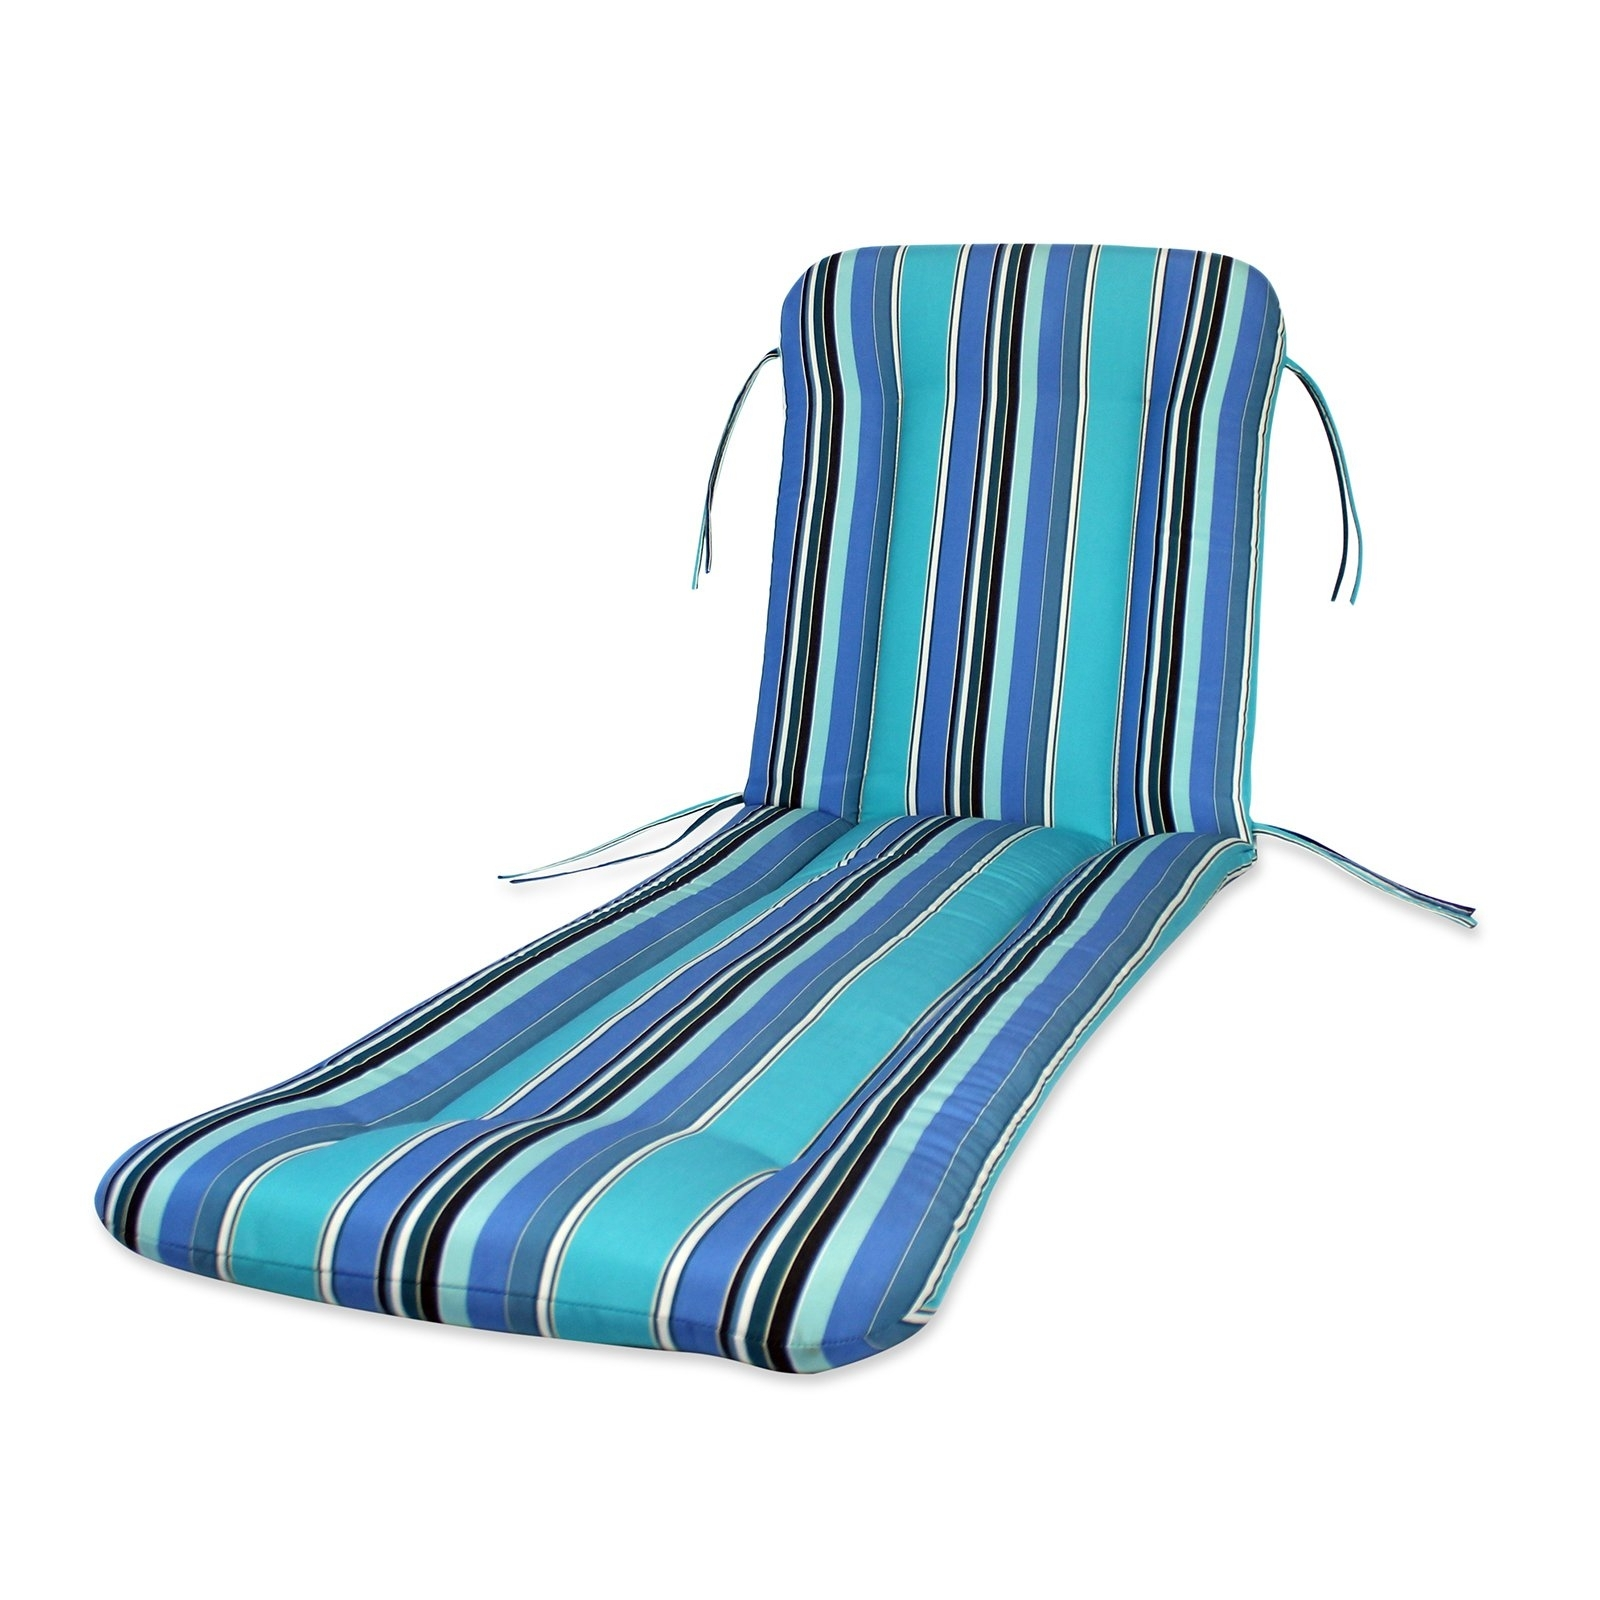 Comfort Classics Sunbrella Chaise Lounge Cushion – Walmart Regarding Favorite Walmart Chaise Lounge Cushions (View 11 of 15)